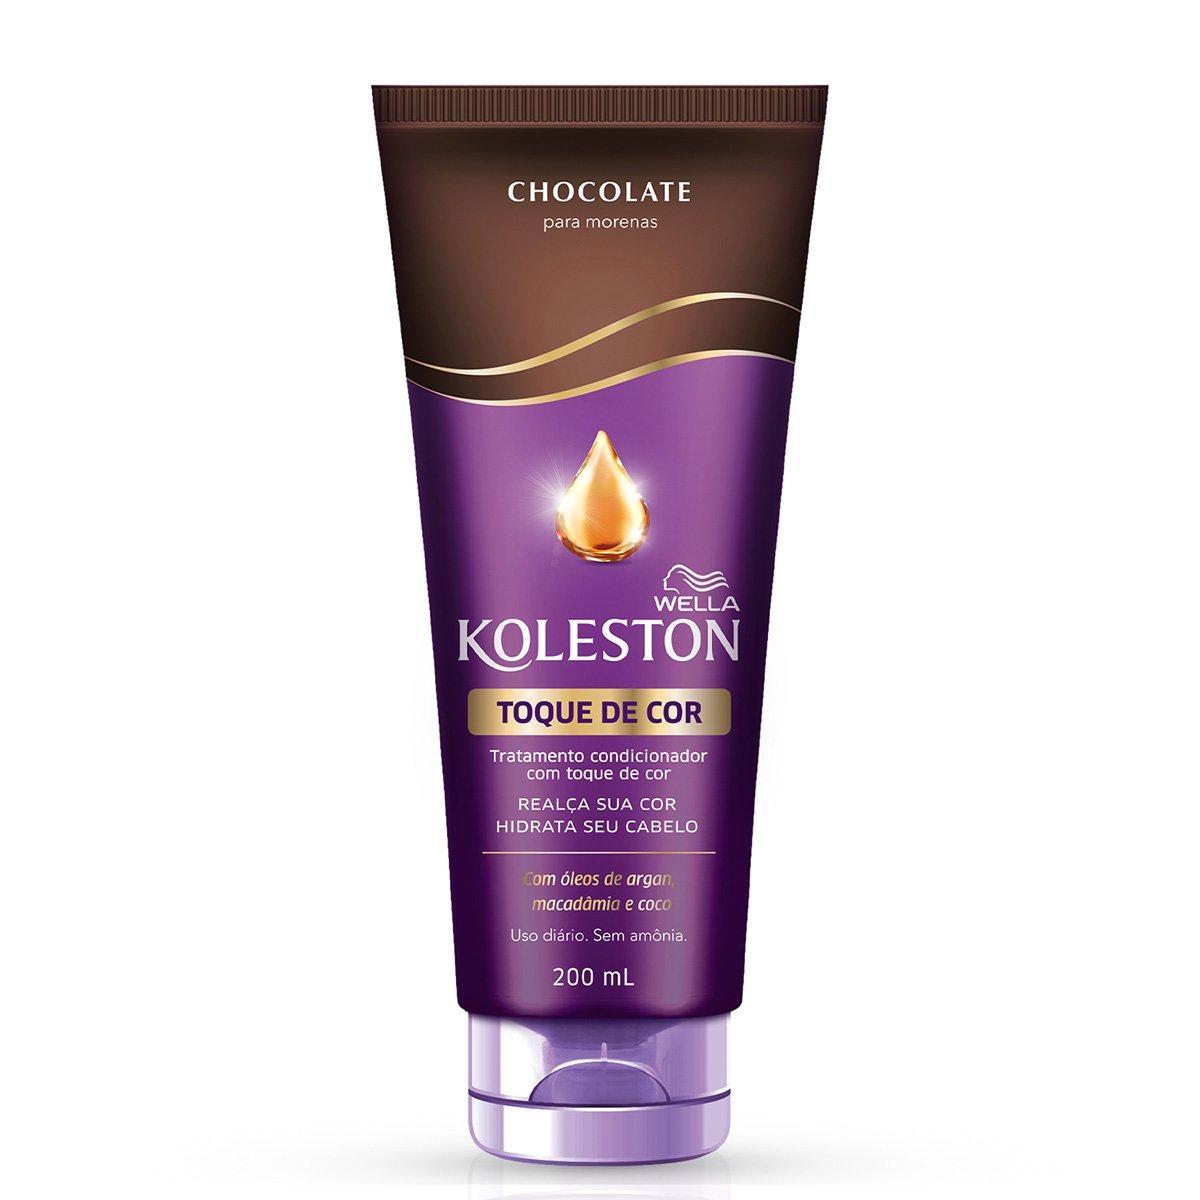 Condicionador Koleston Toque de Cor Chocolate - 200ml